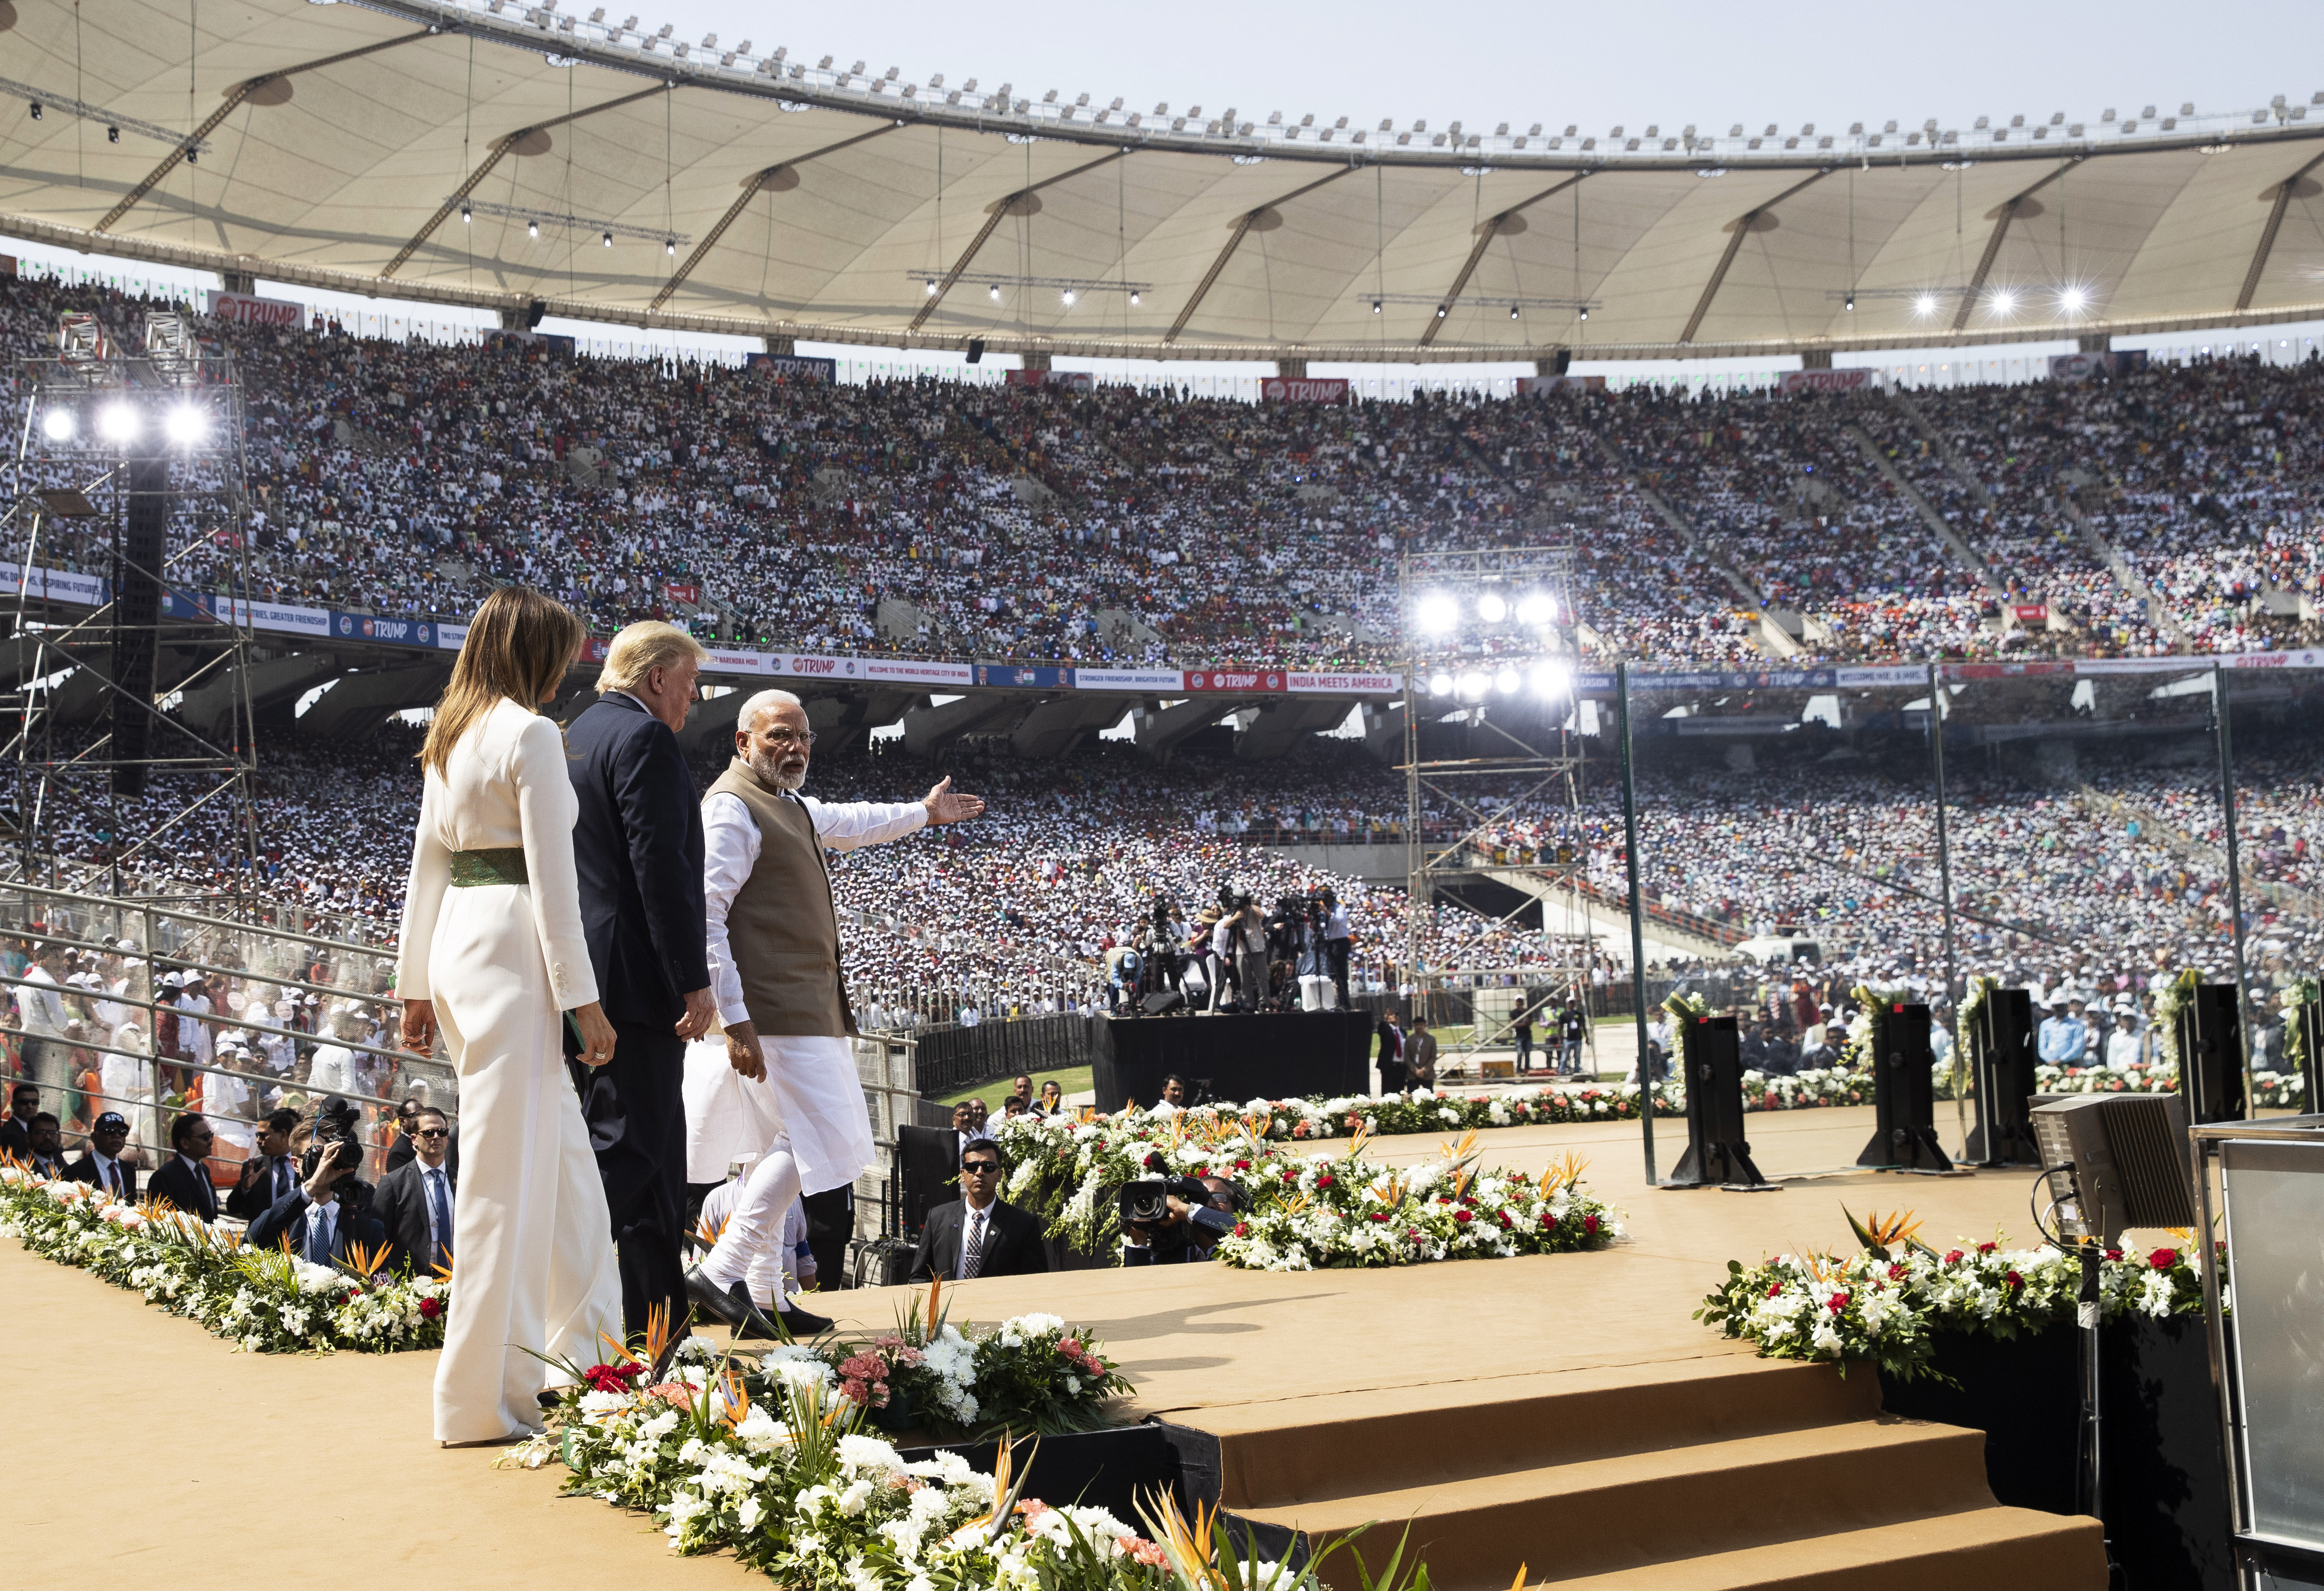 U.S. President Donald Trump, first lady Melania Trump, and Indian Prime Minister Narendra Modi arrive for a  Namaste Trump,  event at Sardar Patel Stadium, Monday, Feb. 24, 2020, in Ahmedabad, India.